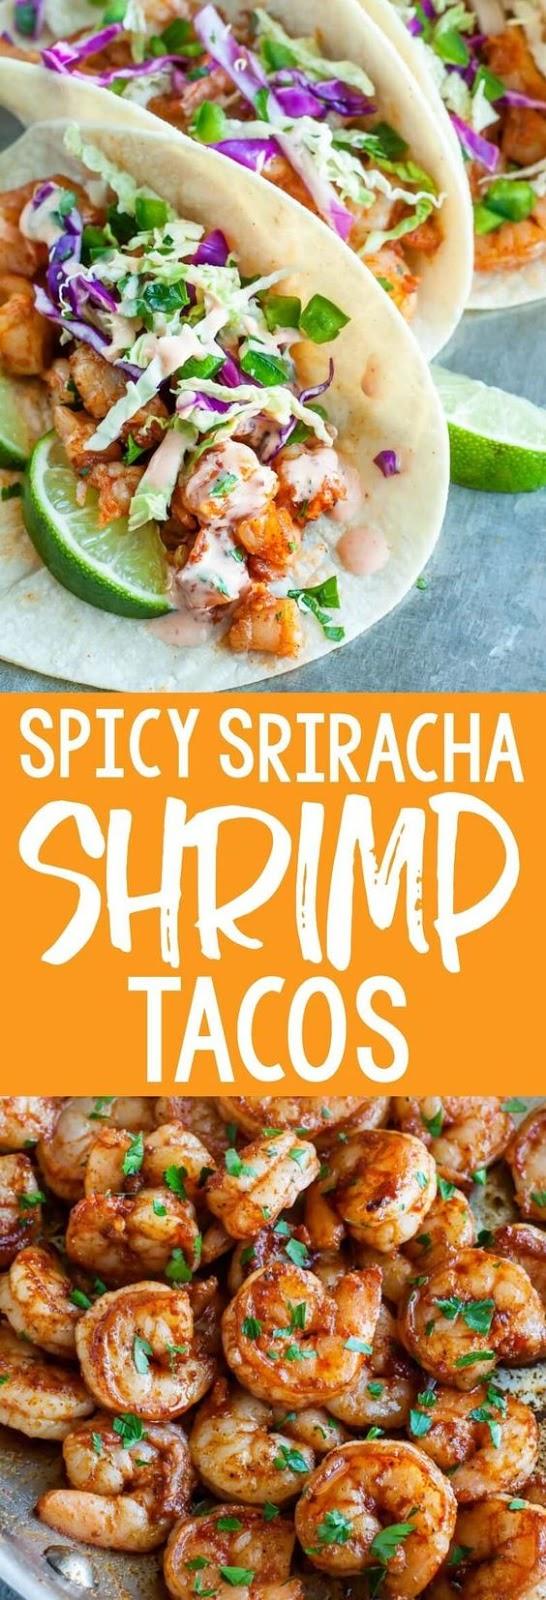 Spicy Sriracha Shrimp Tacos with Cilantro Lime Slaw